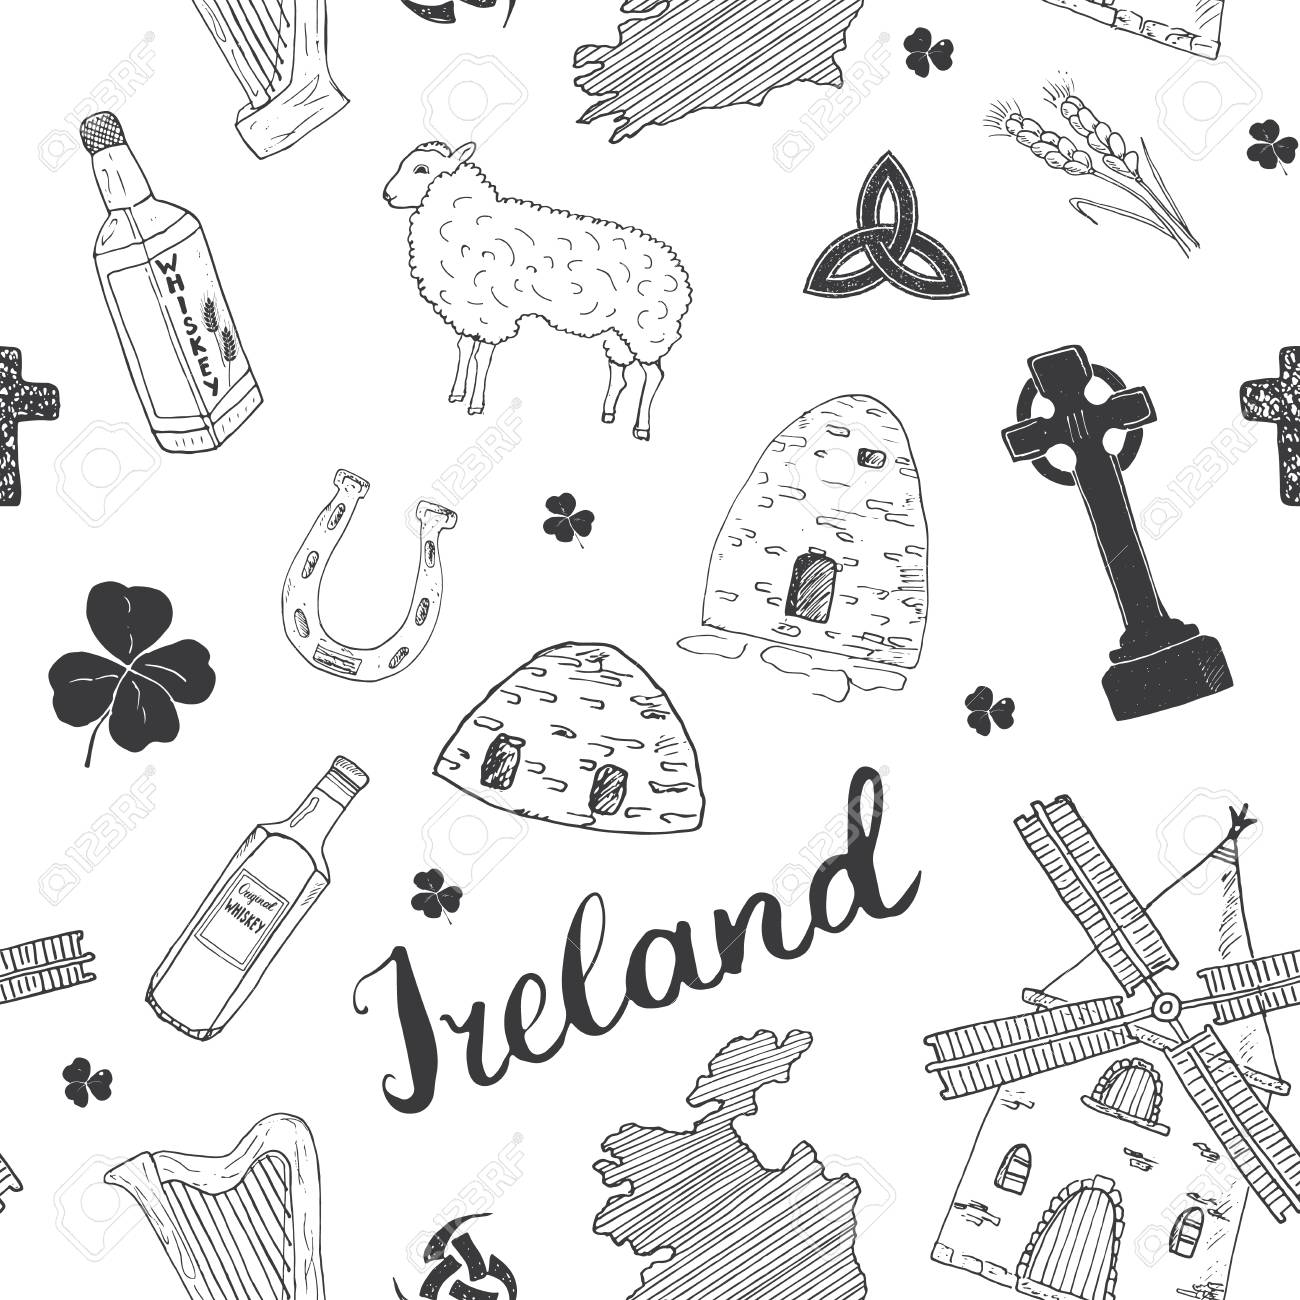 Sketch Map Of Ireland.Ireland Sketch Doodles Seamless Pattern Irish Elements With